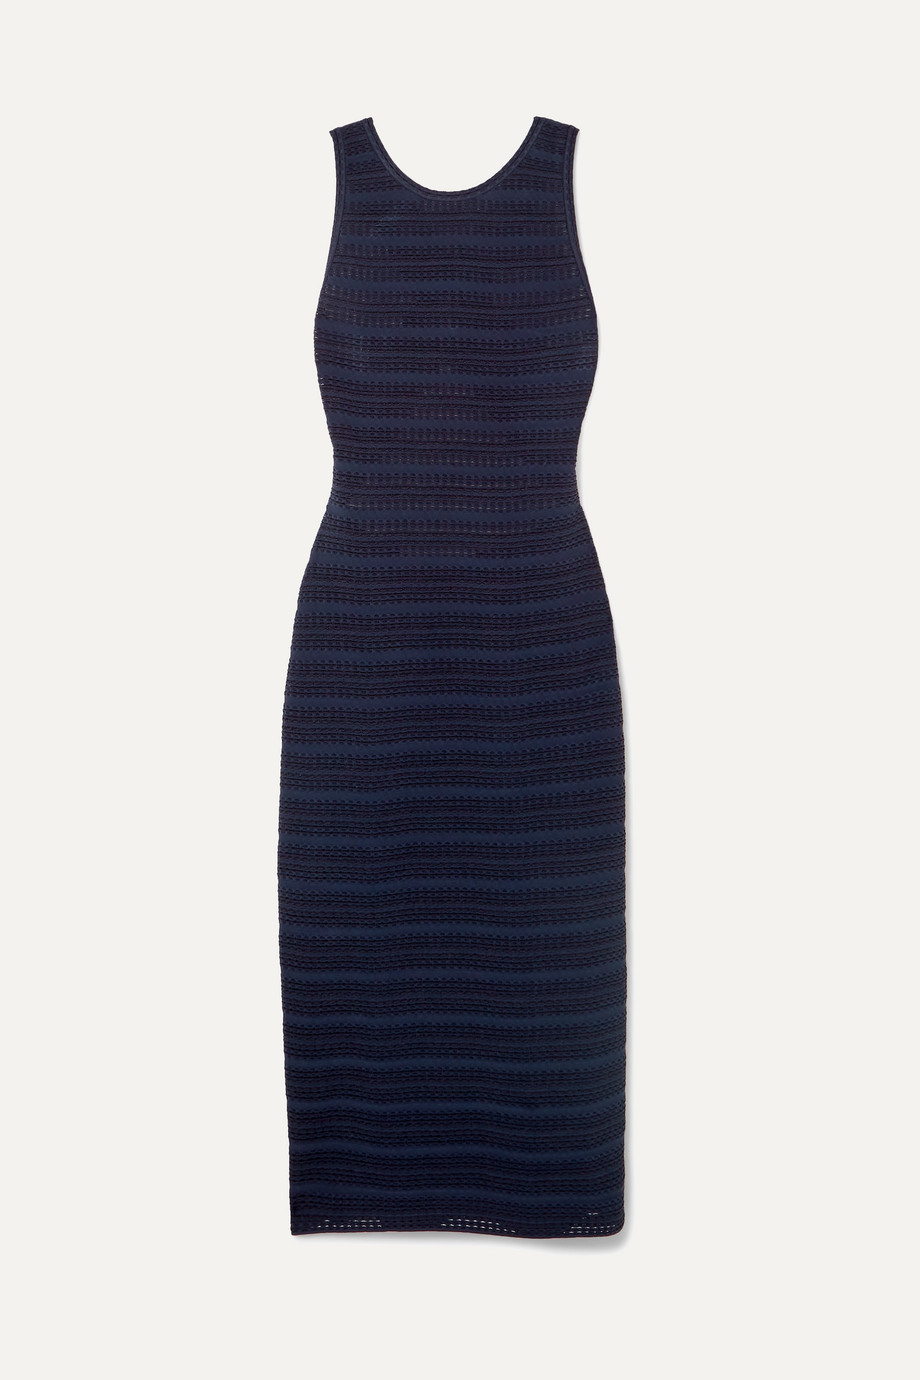 Alaïa Open-back jacquard-knit dress